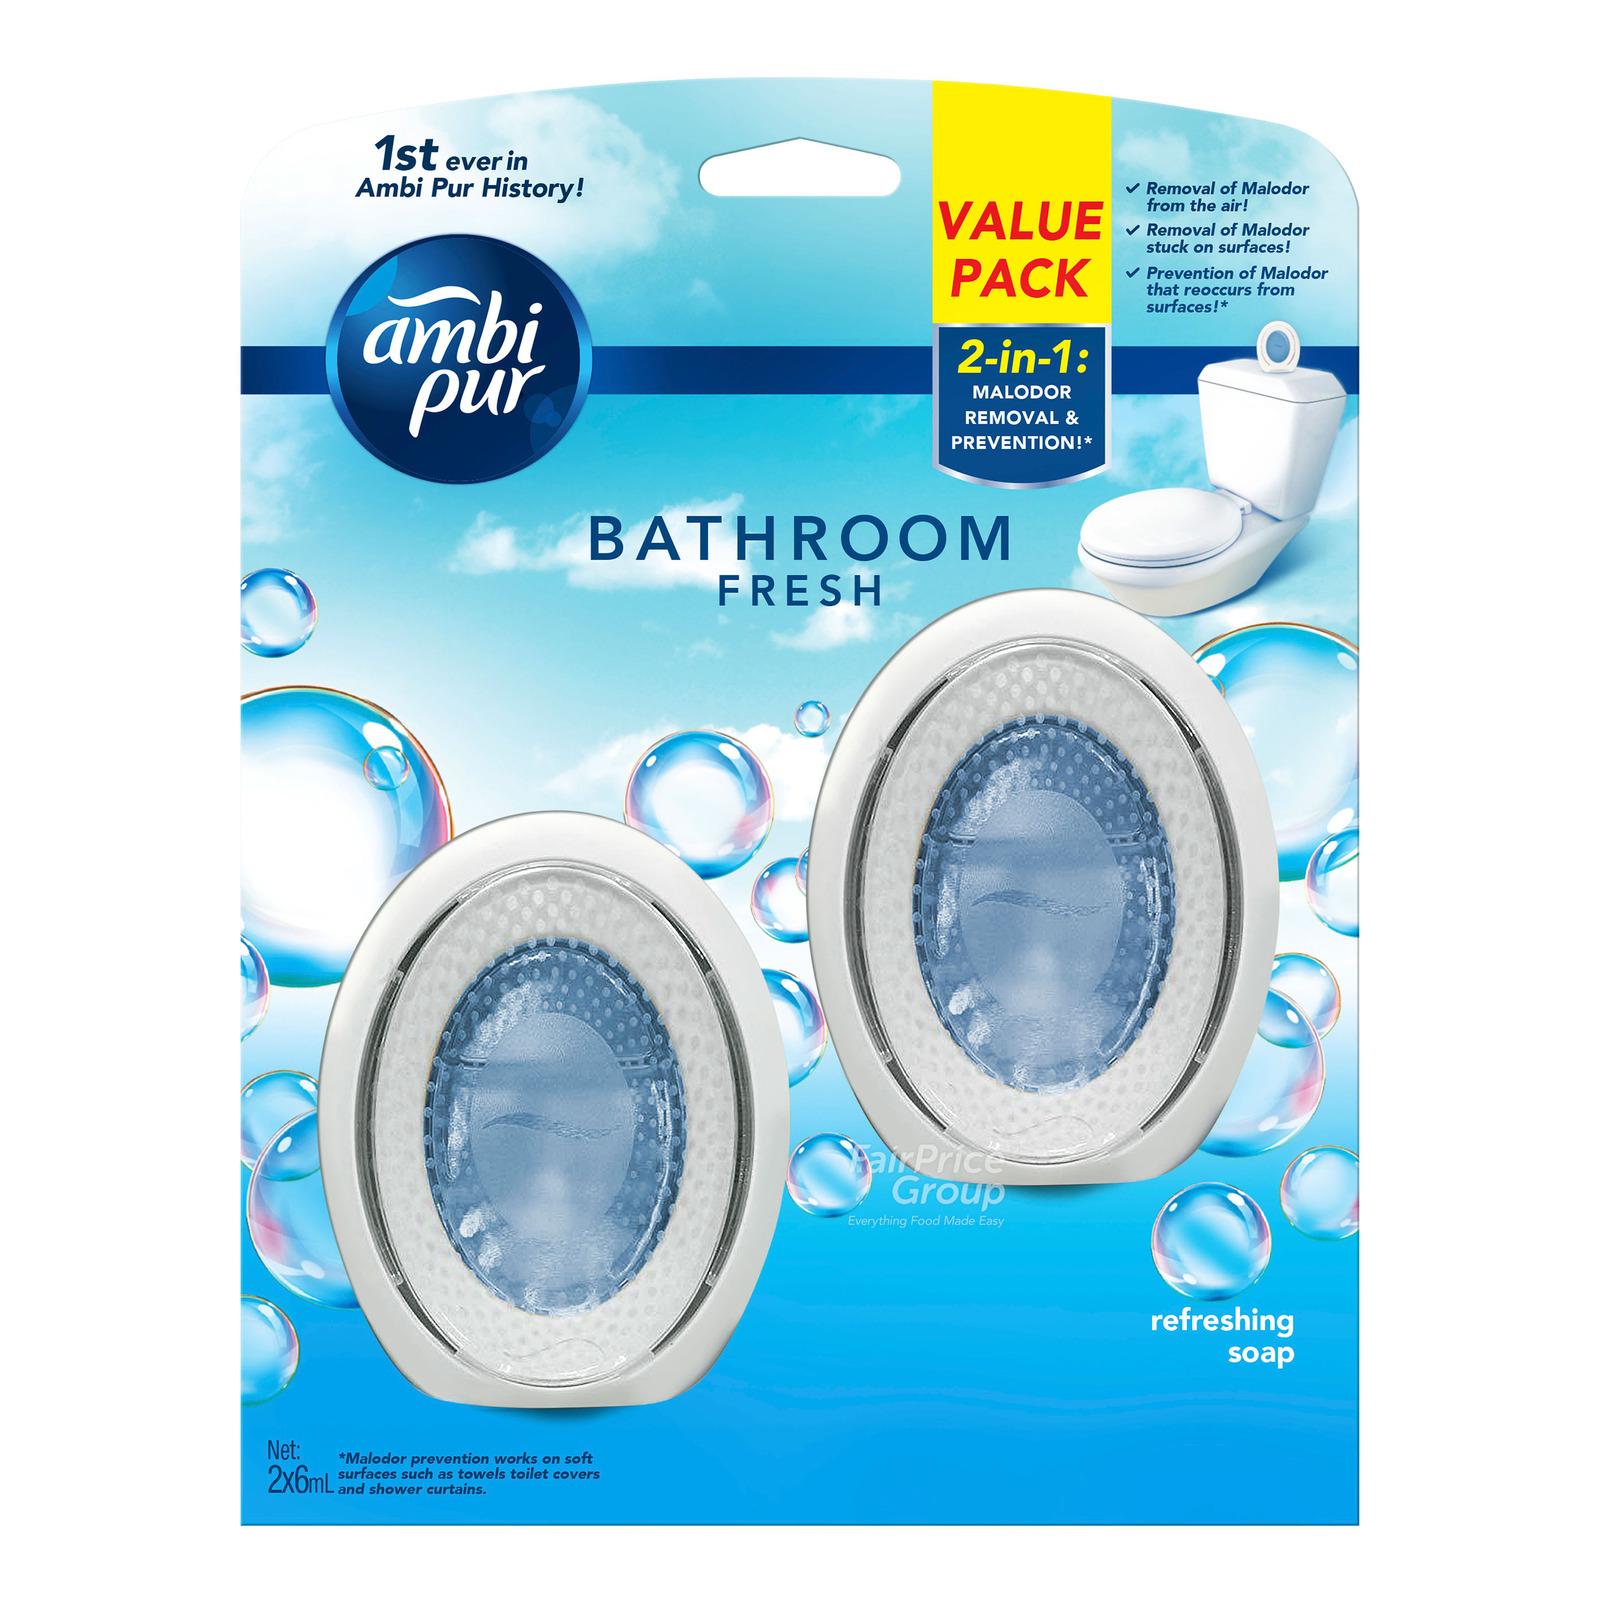 Ambi Pur Bathroom Fresh Freshener - Refreshing Soap